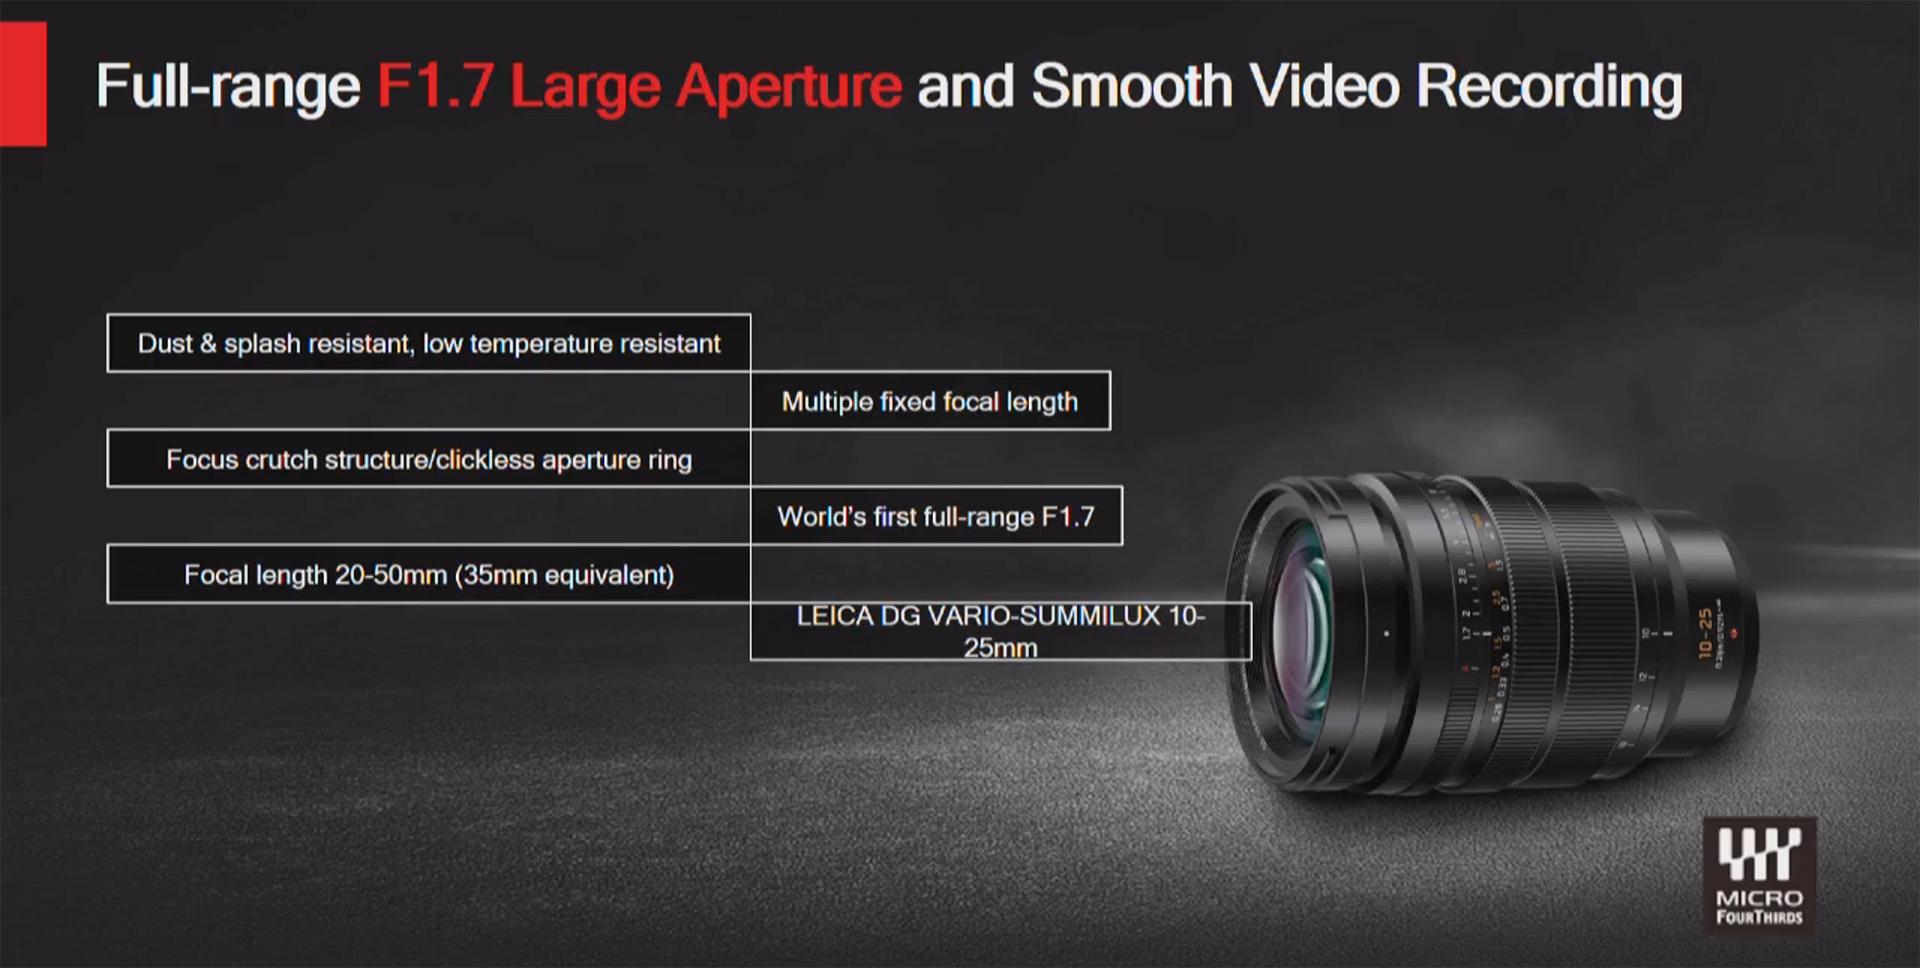 Panasonic S1 Firmware Update, LUMIX S Teleconverters and 10-25mm F